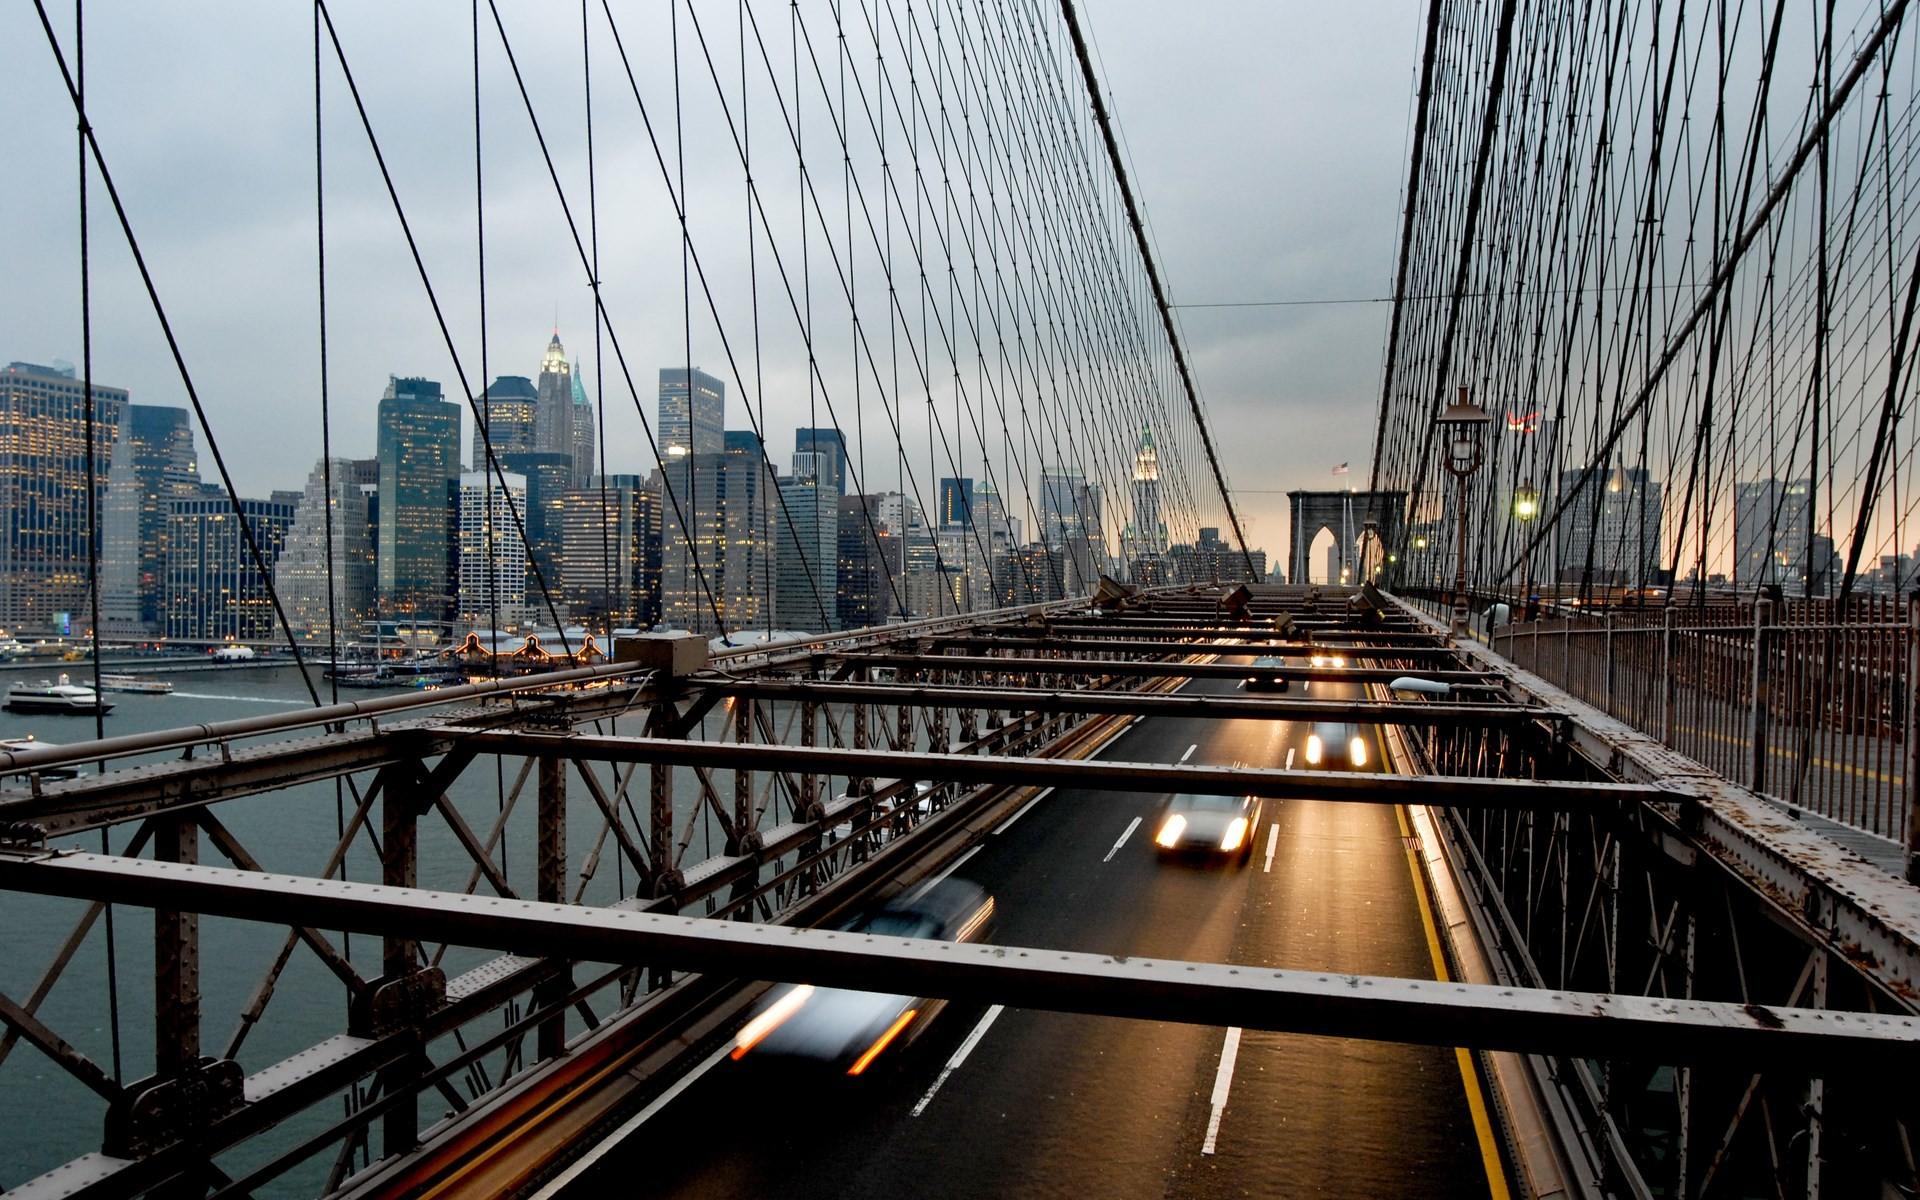 Best Wallpaper Night Brooklyn Bridge - 970339-brooklyn-bridge-wallpaper-1920x1200-macbook  2018.jpg